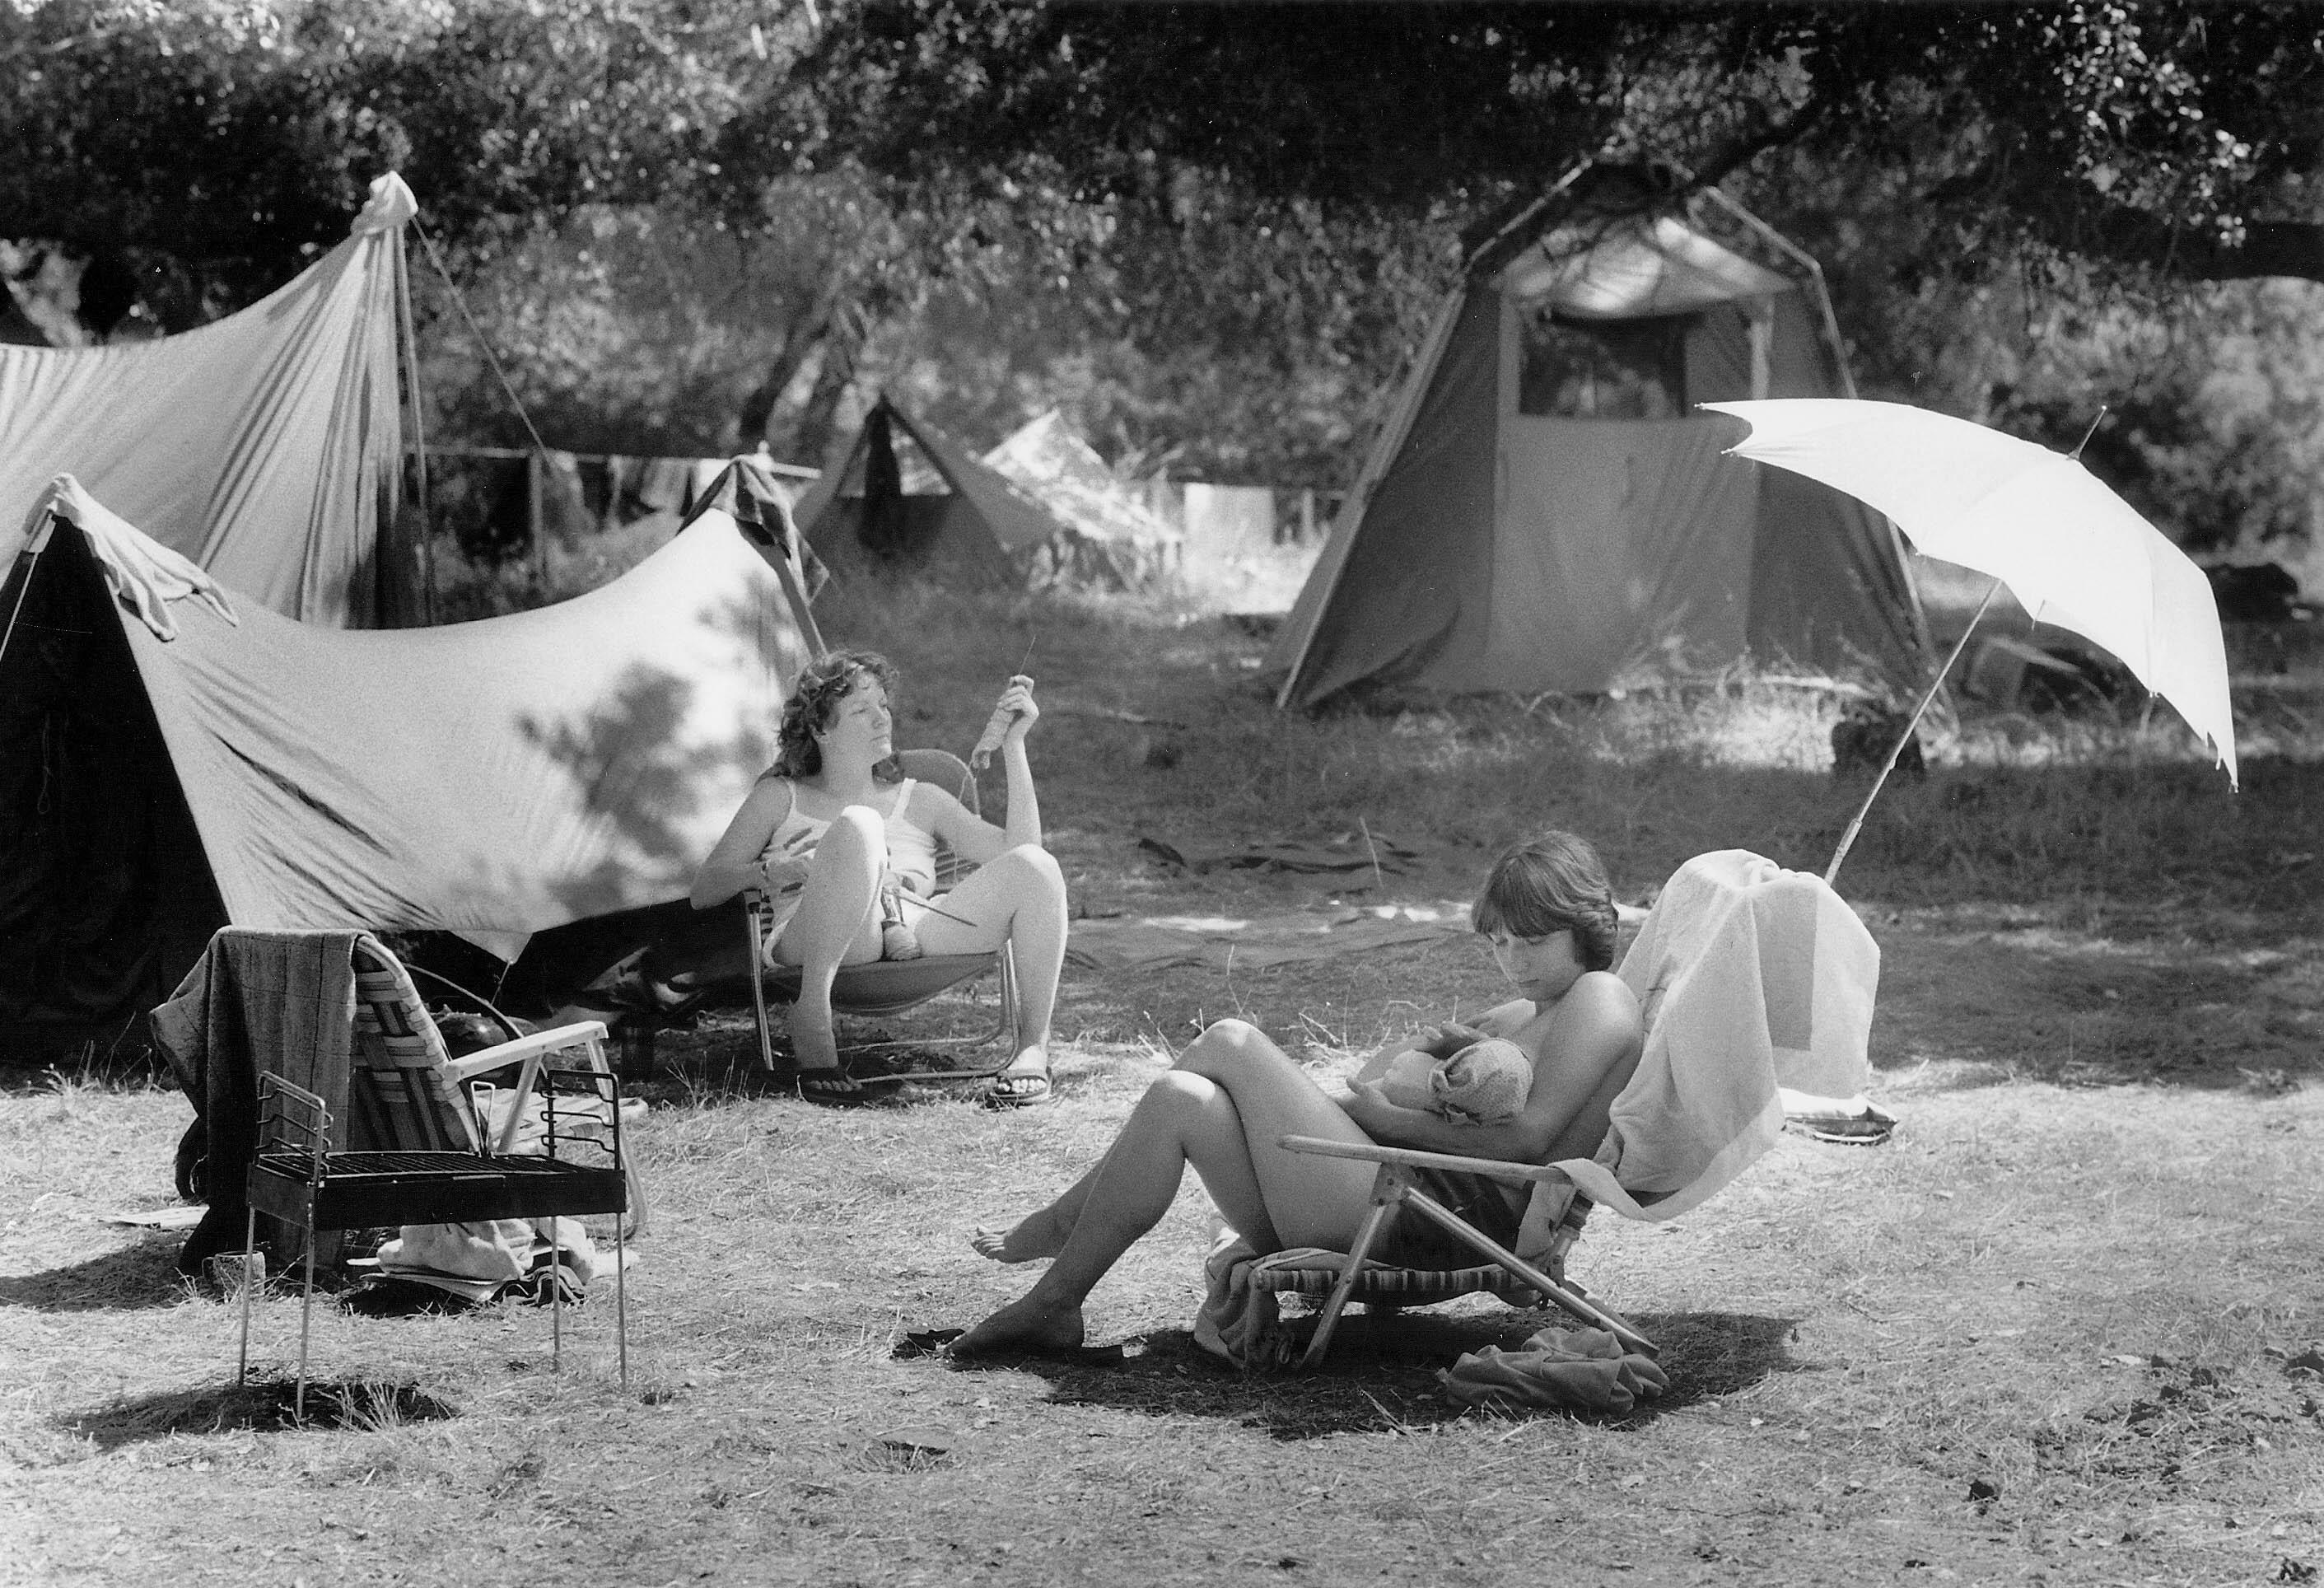 Lesbians camping